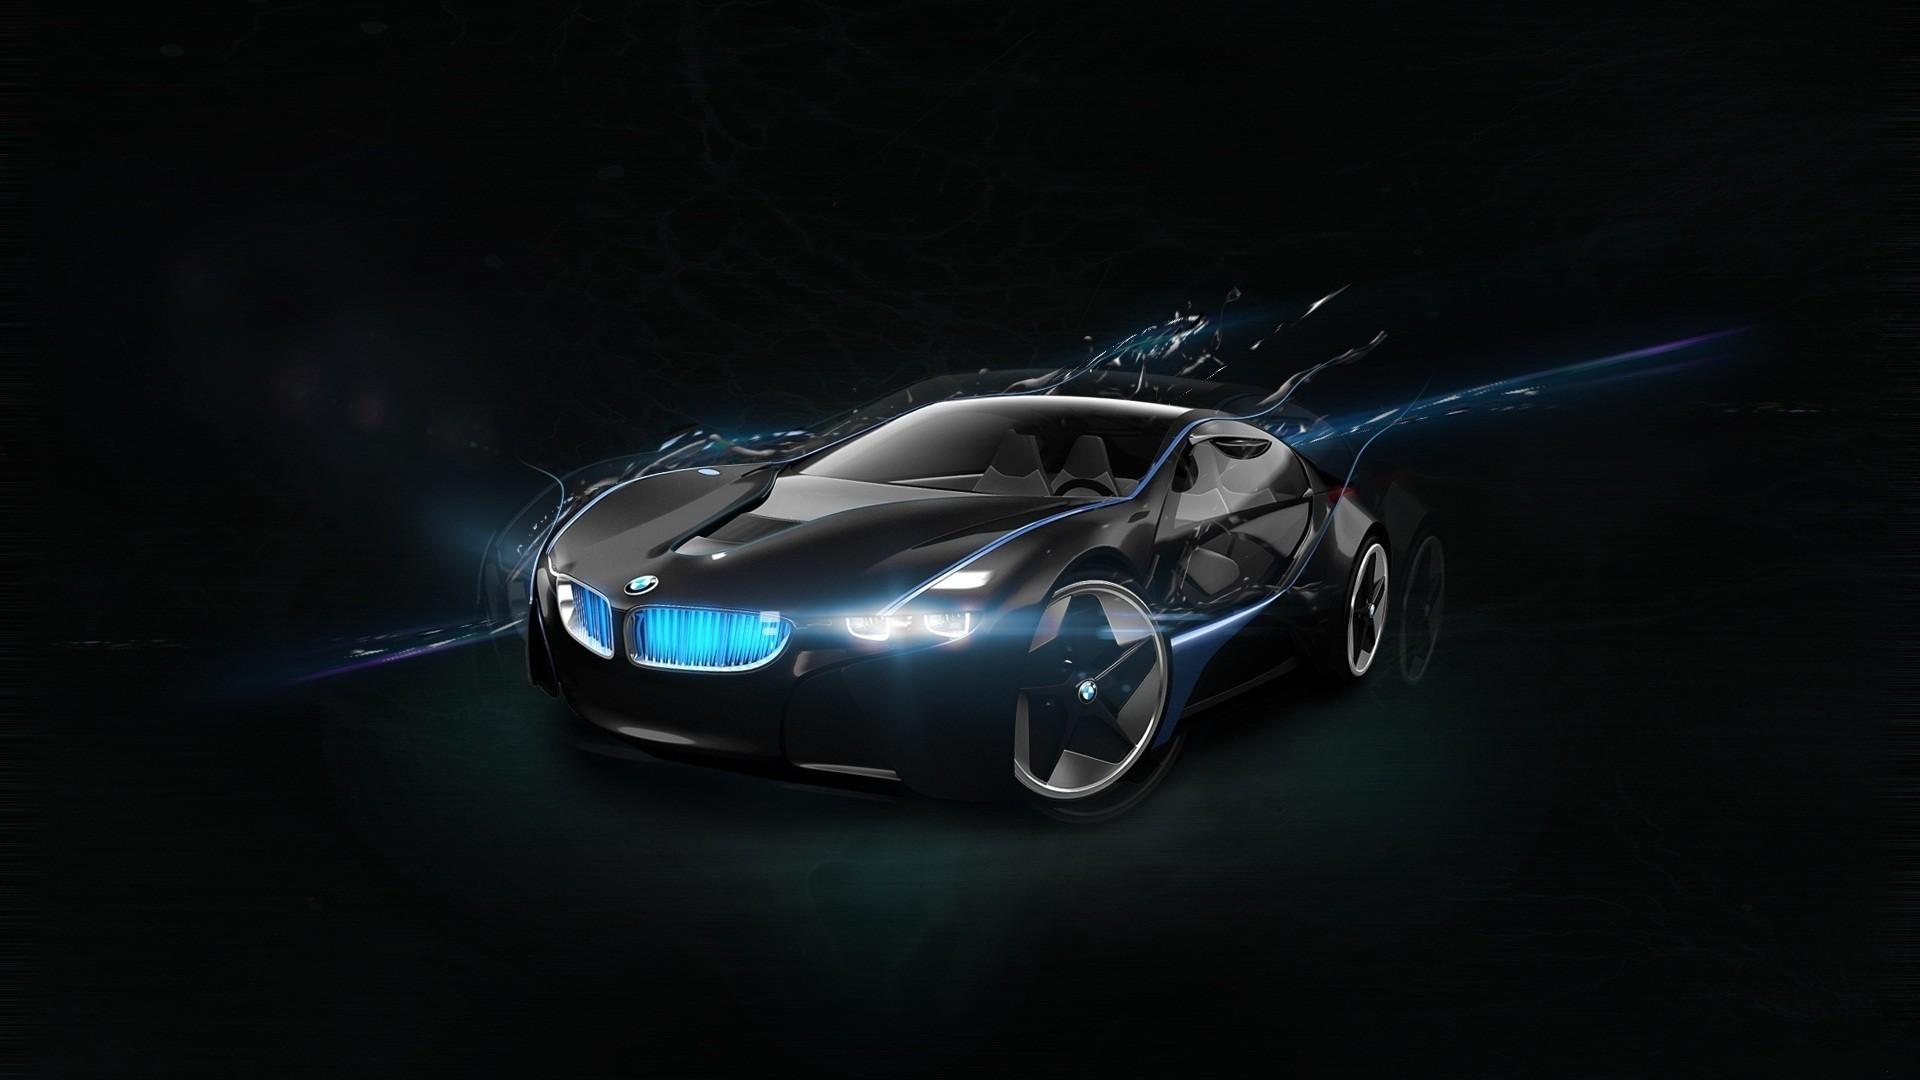 Wallpaper Sports Car Supercars Cgi Bmw Vision Concept Cars